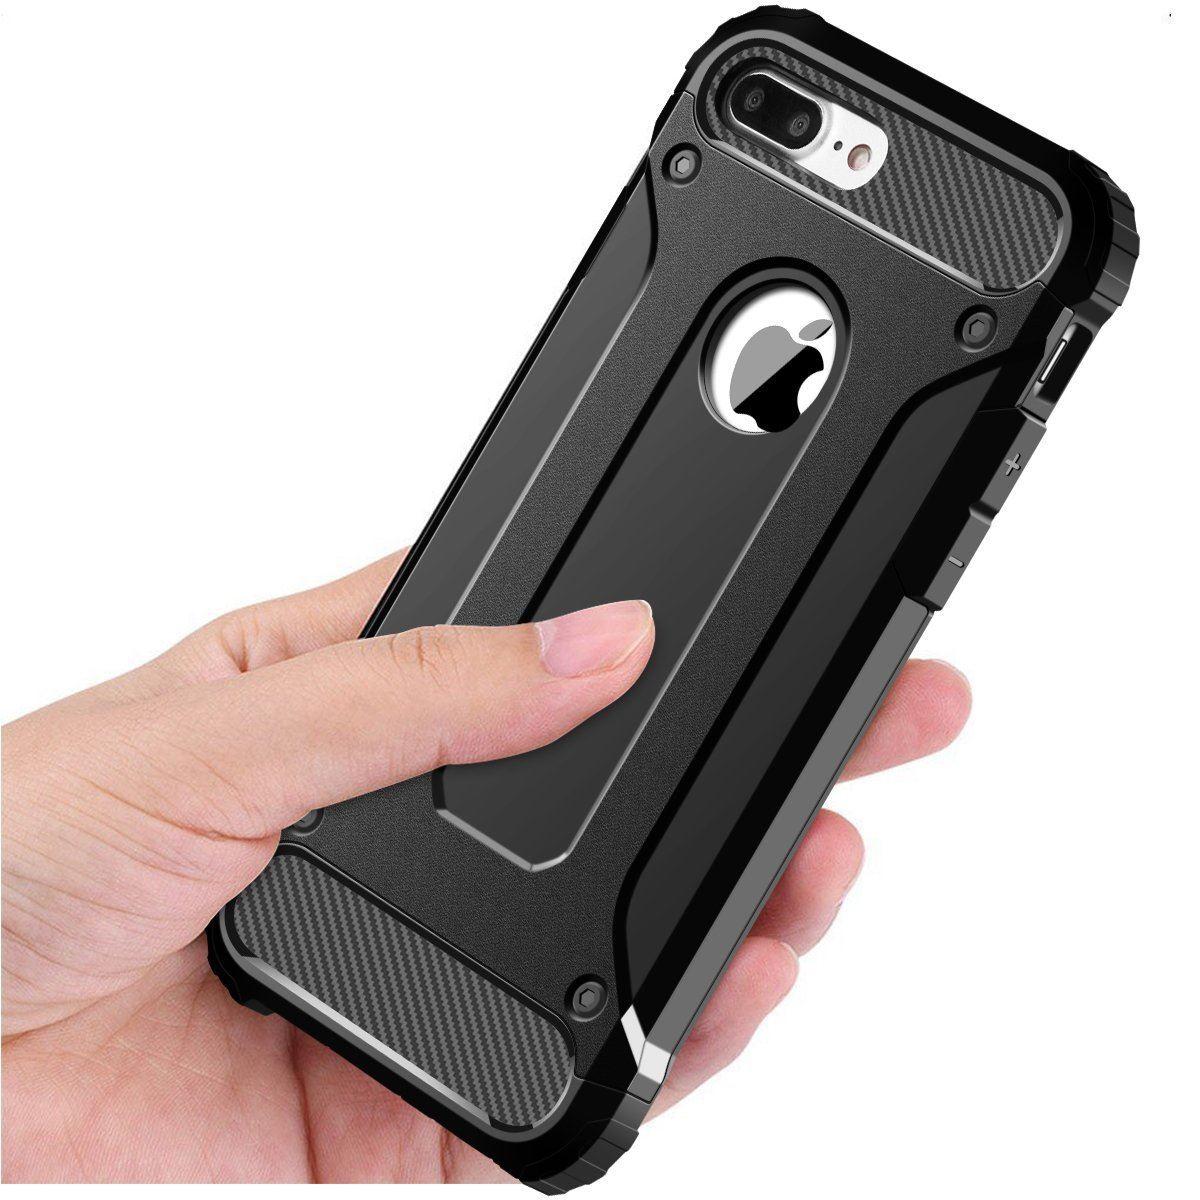 thumbnail 60 - For Apple iPhone 11 Pro Max XR Xs X 8 7 Plus 6 5 Se Case Cover Tough Armor